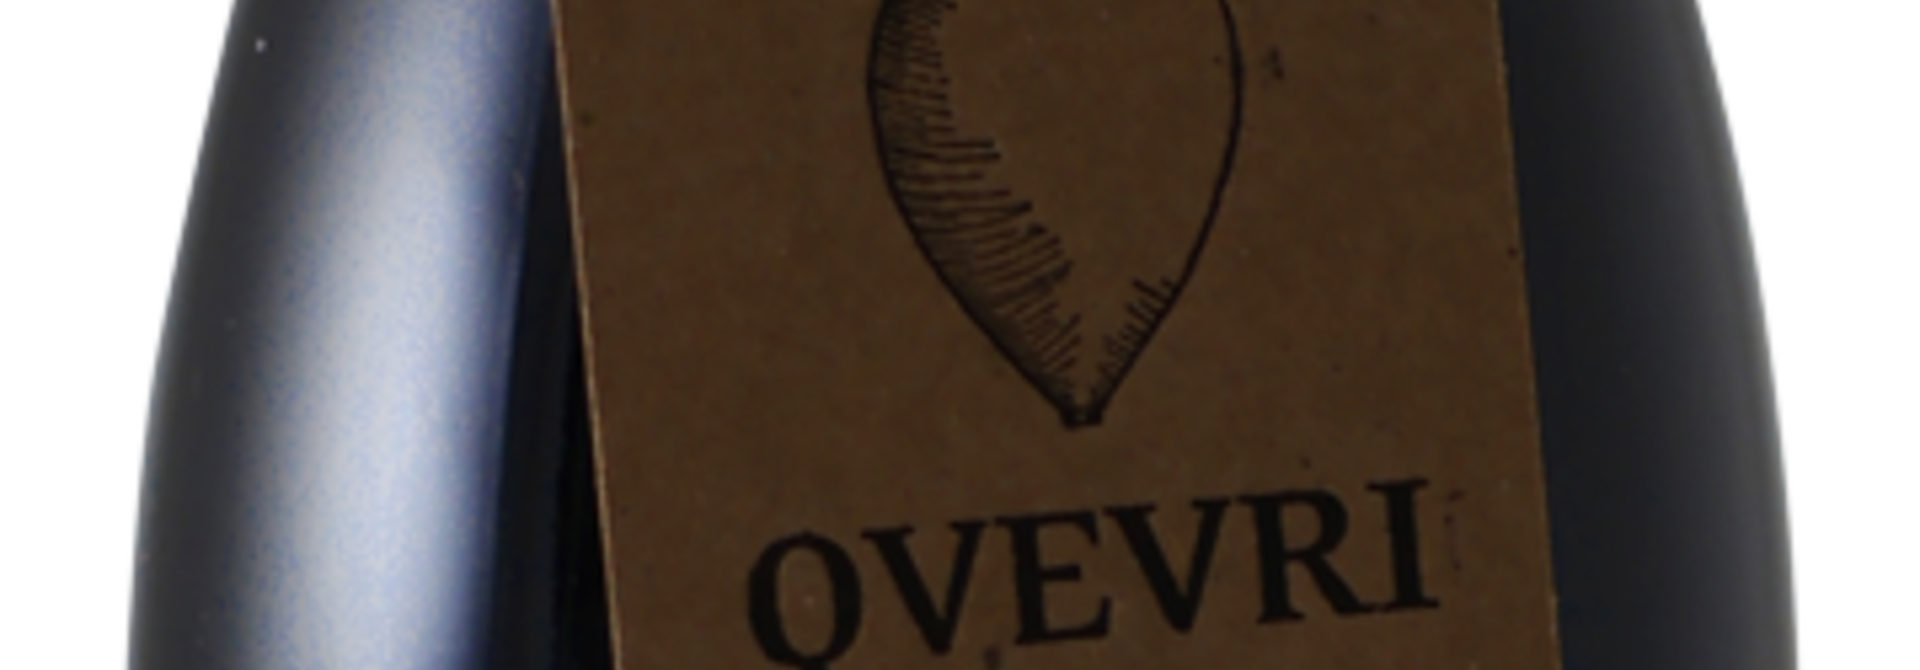 Avondale Qvevri 2018